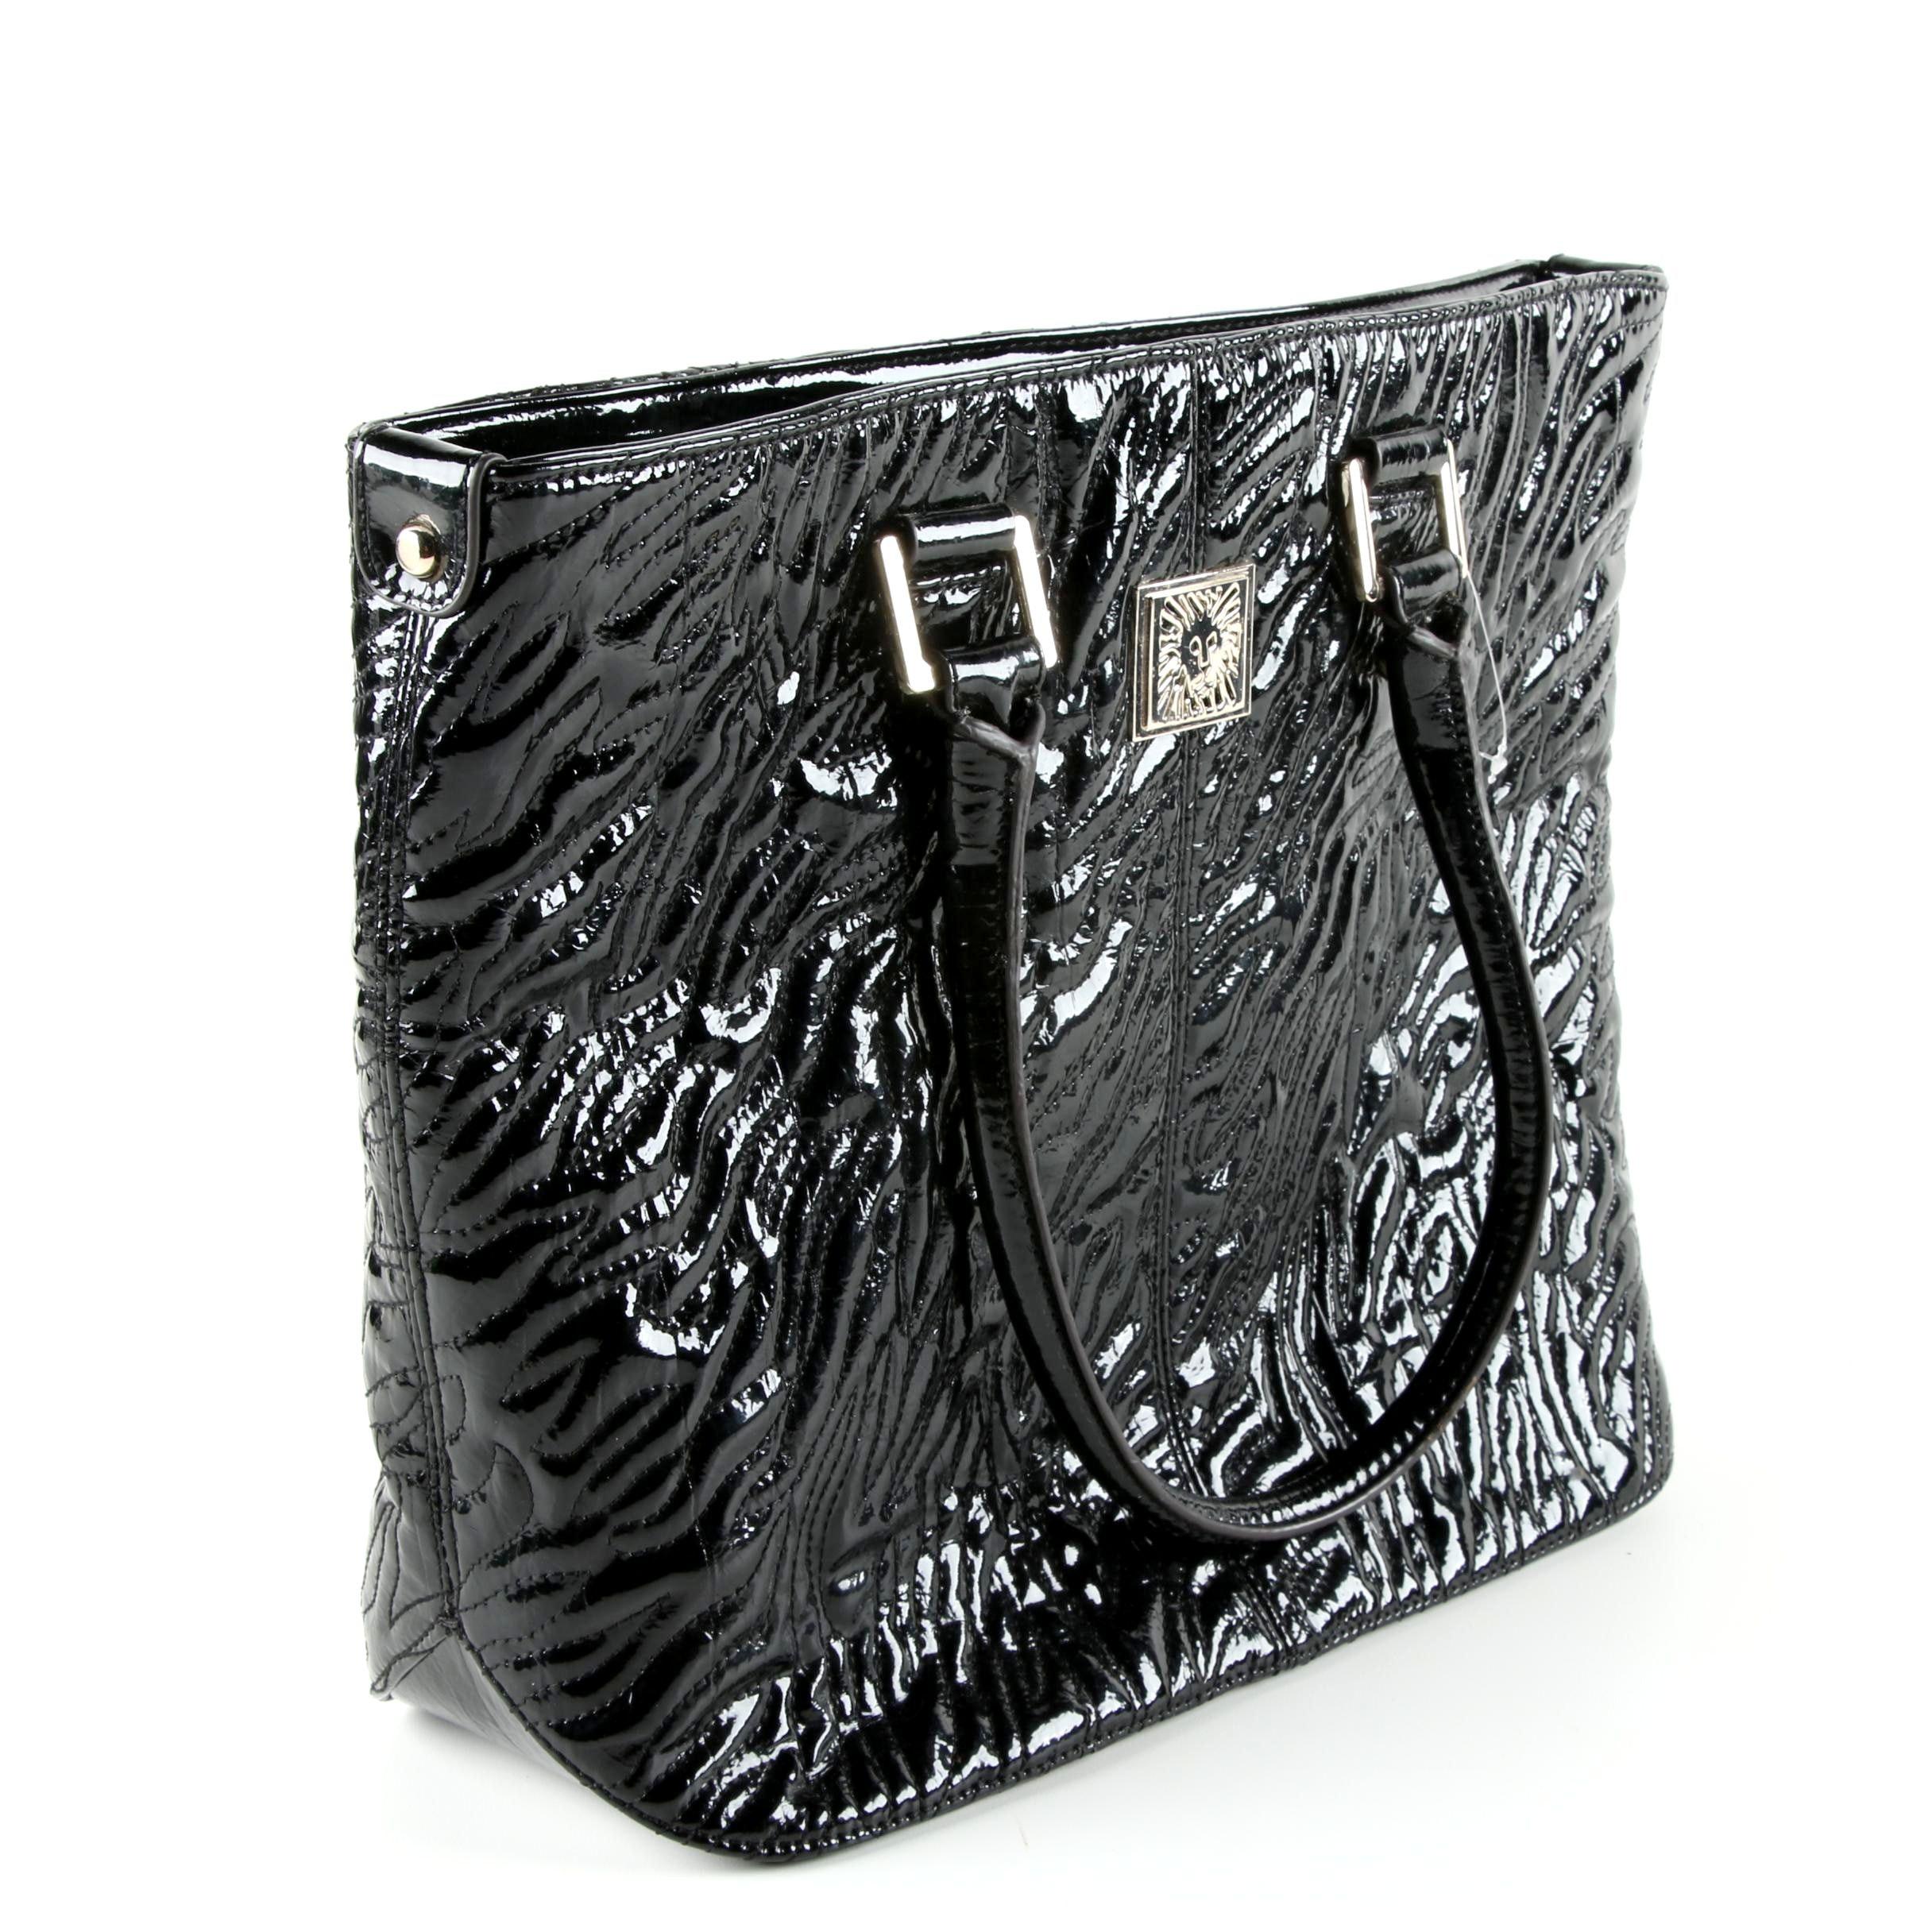 Anne Klein Glossy Black Tote Bag